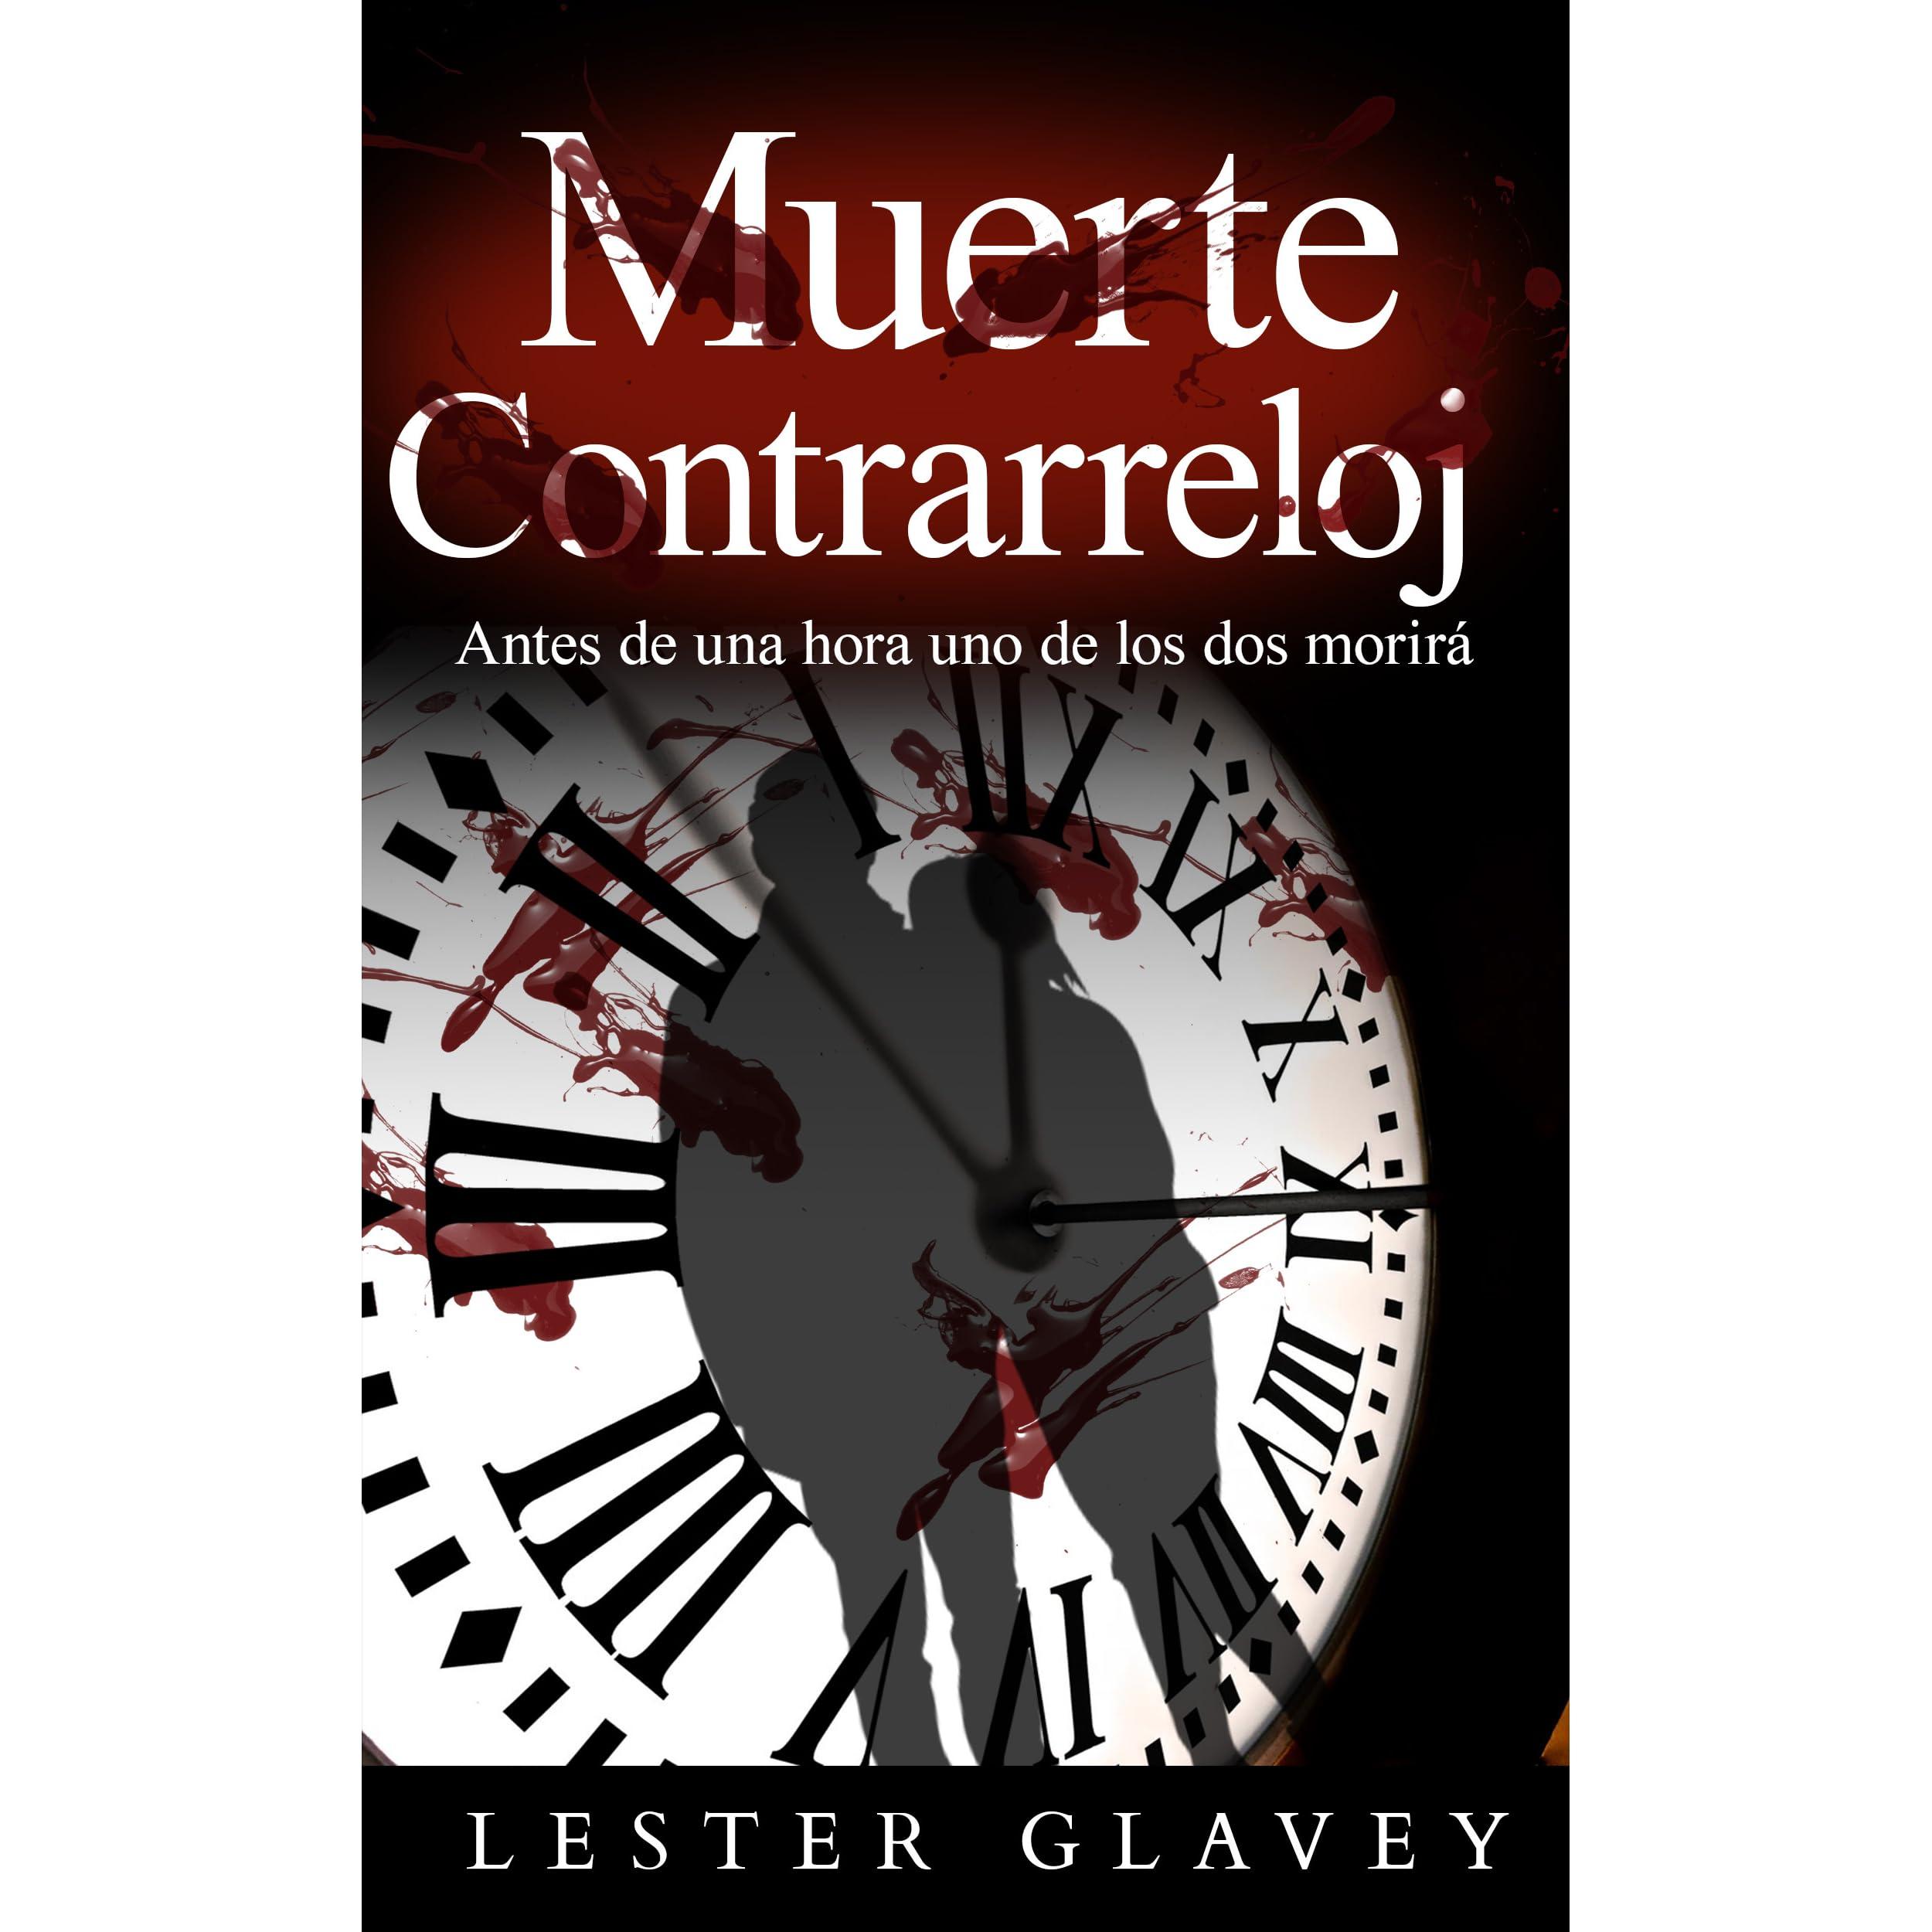 muerte contrarreloj spanish edition ebook